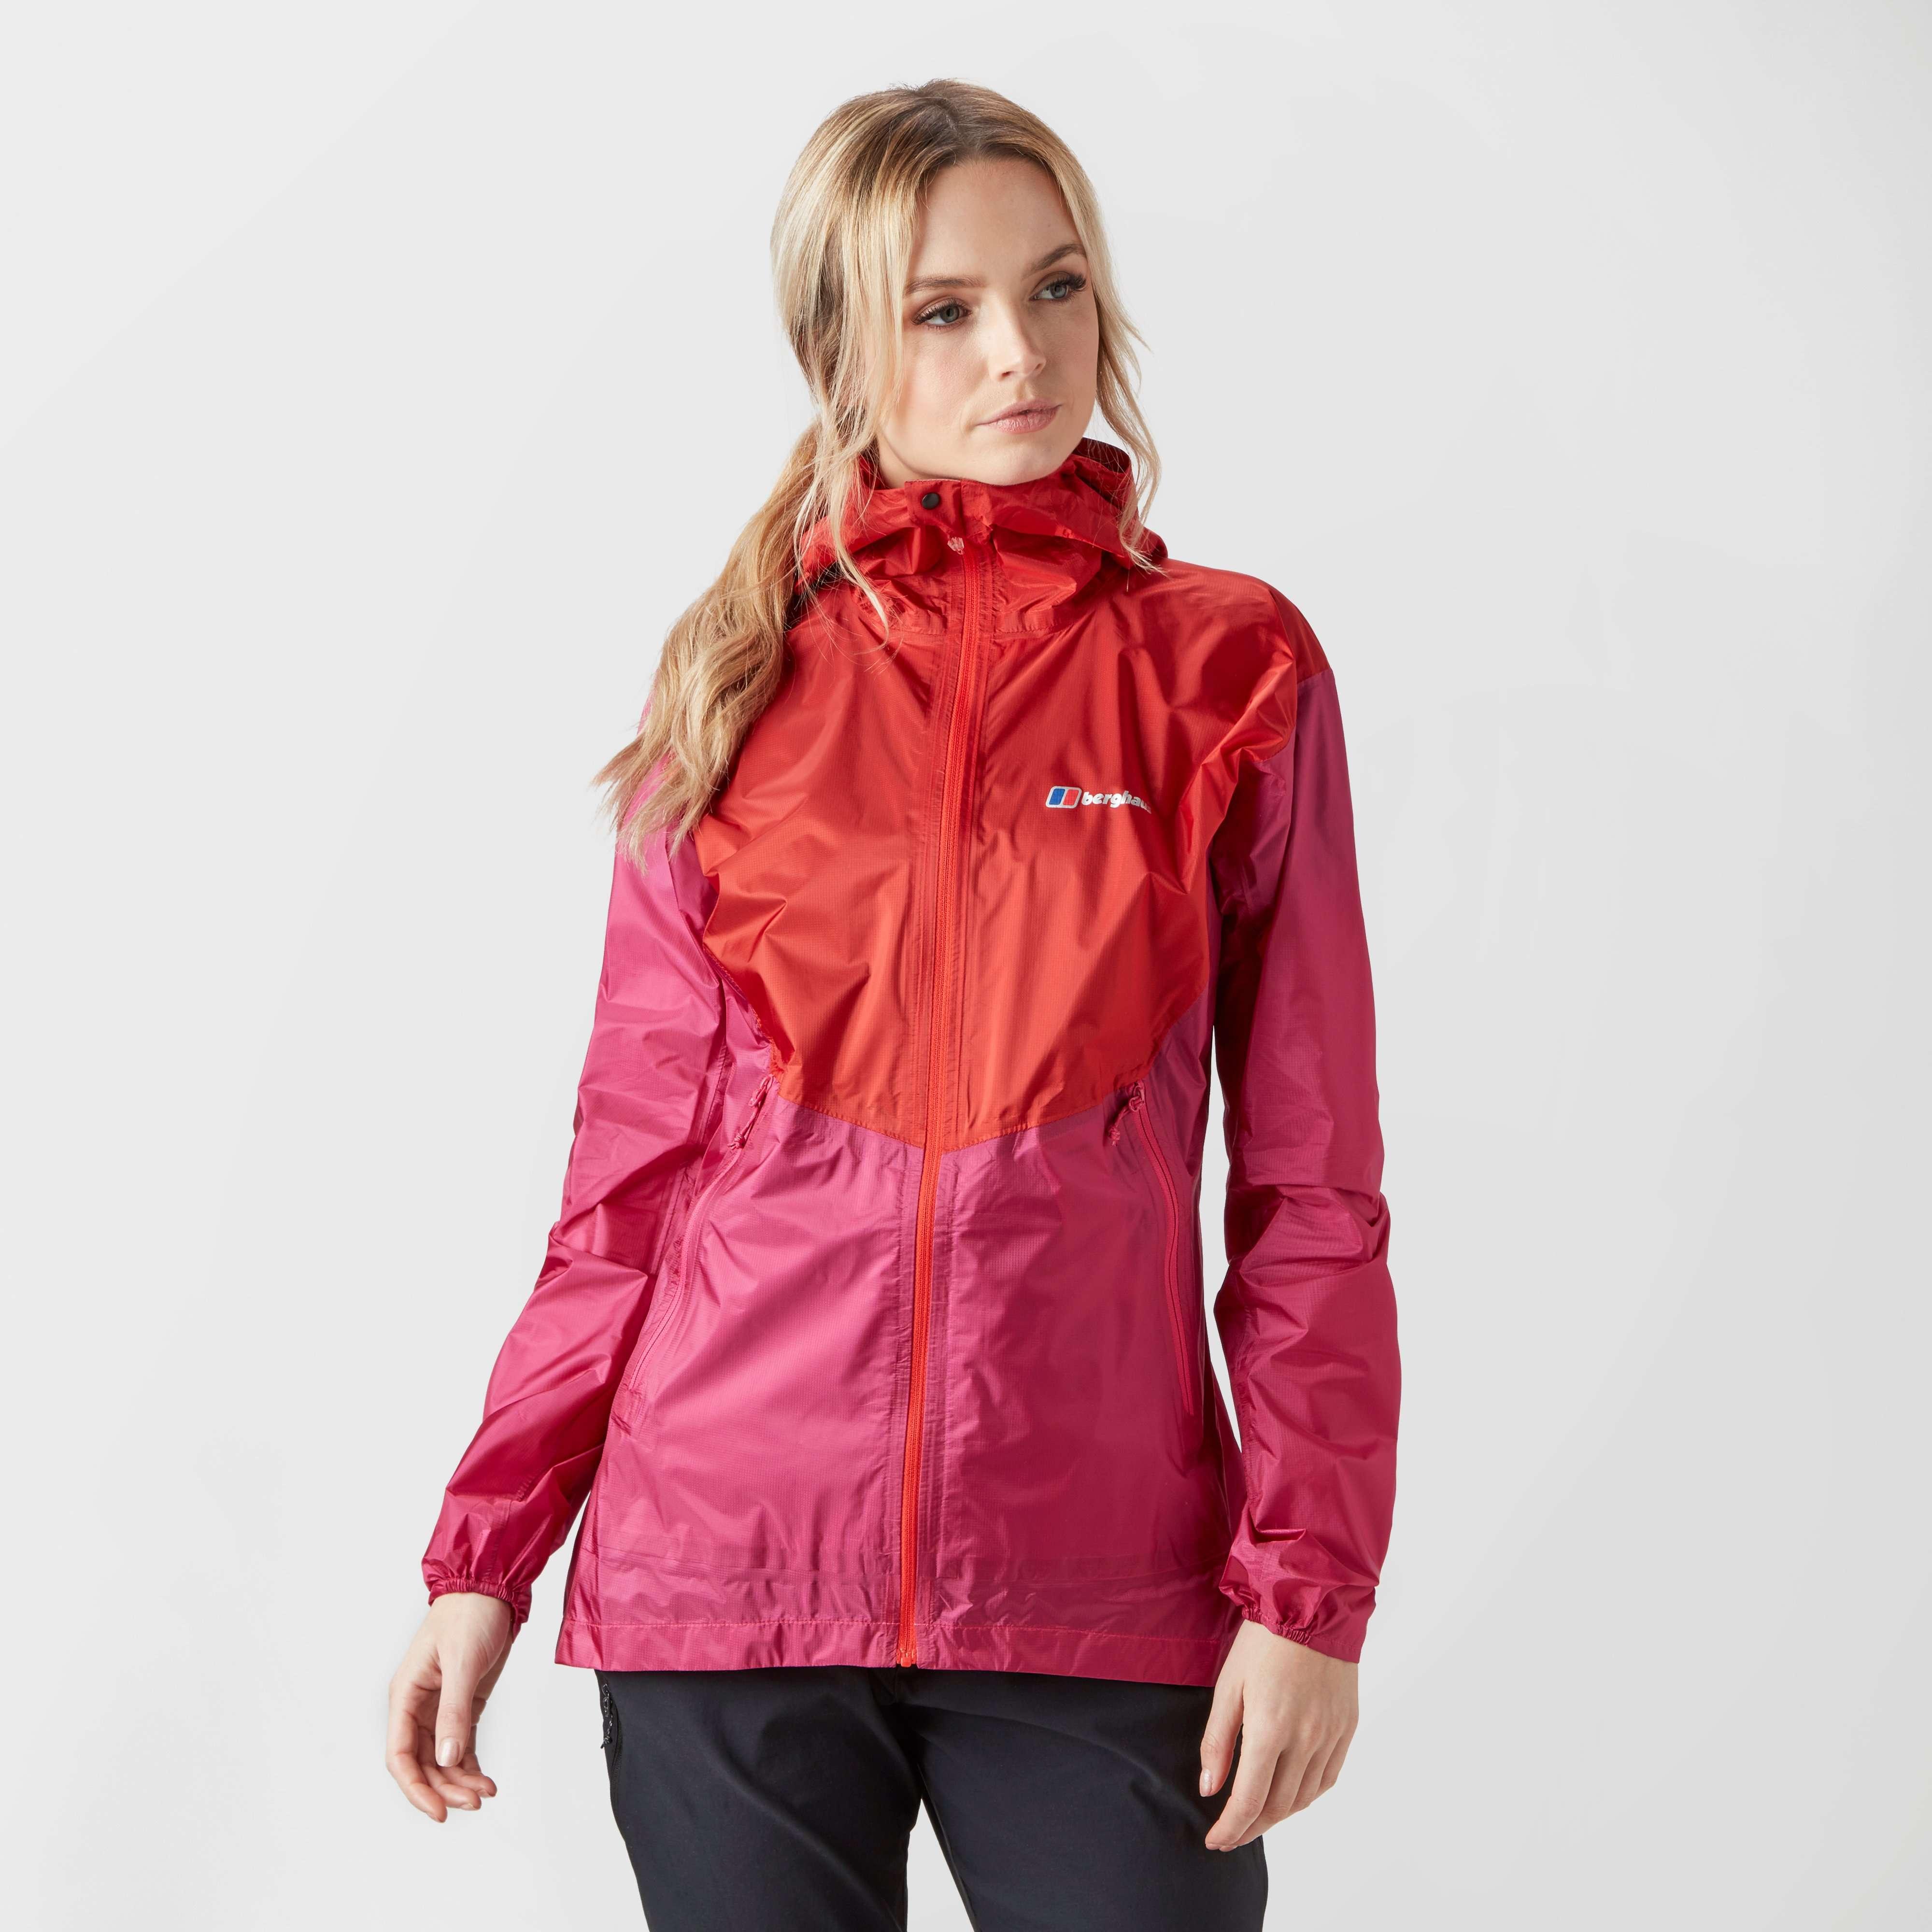 BERGHAUS Women's Fast Hike Jacket